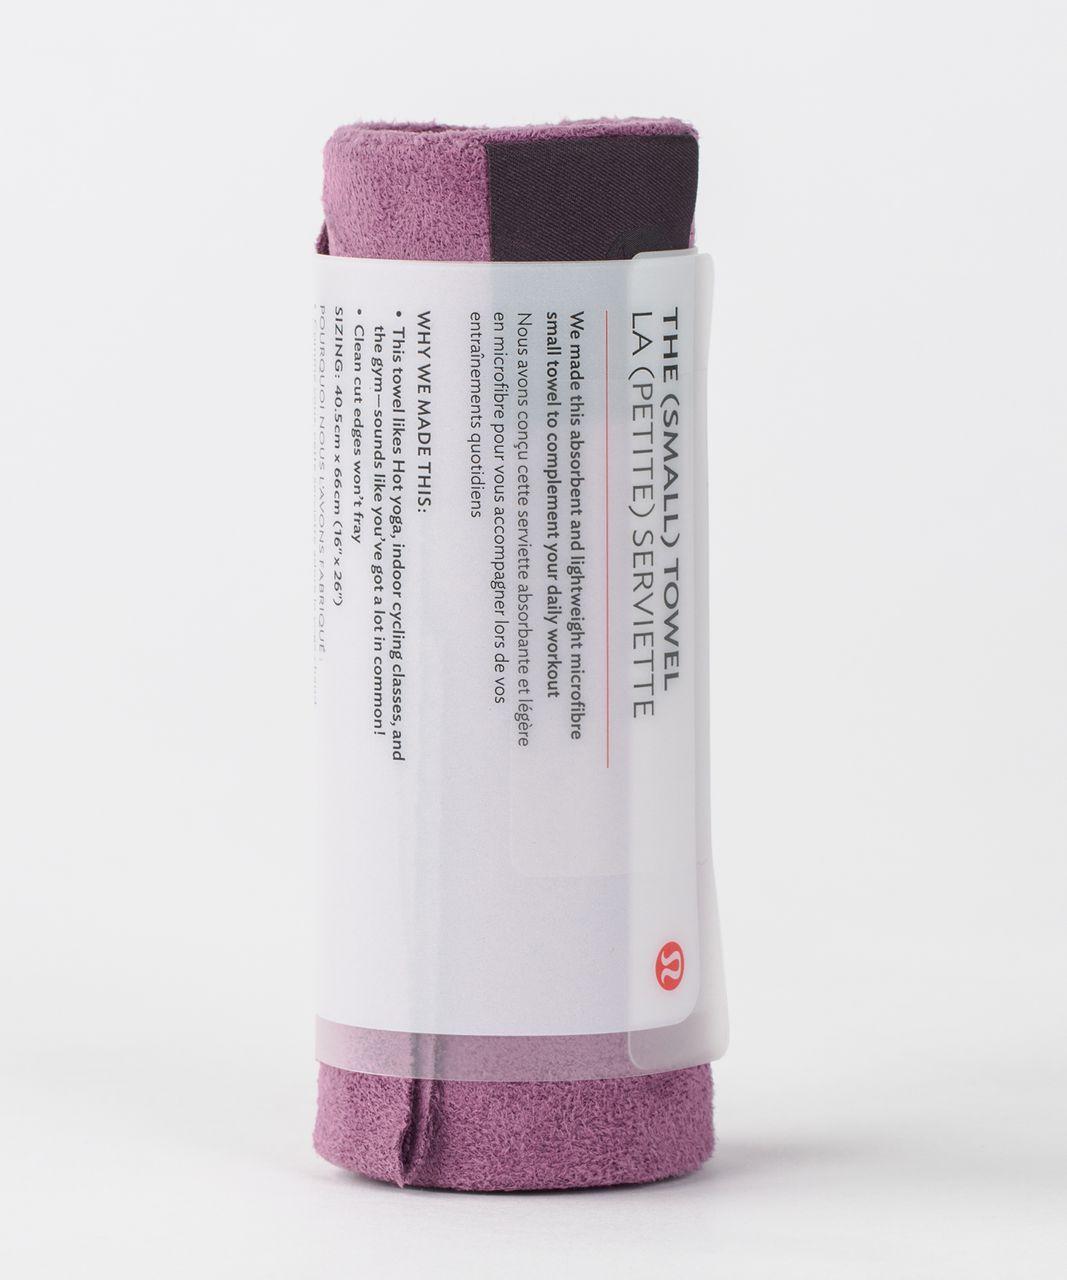 Lululemon The (Small) Towel - Mystic